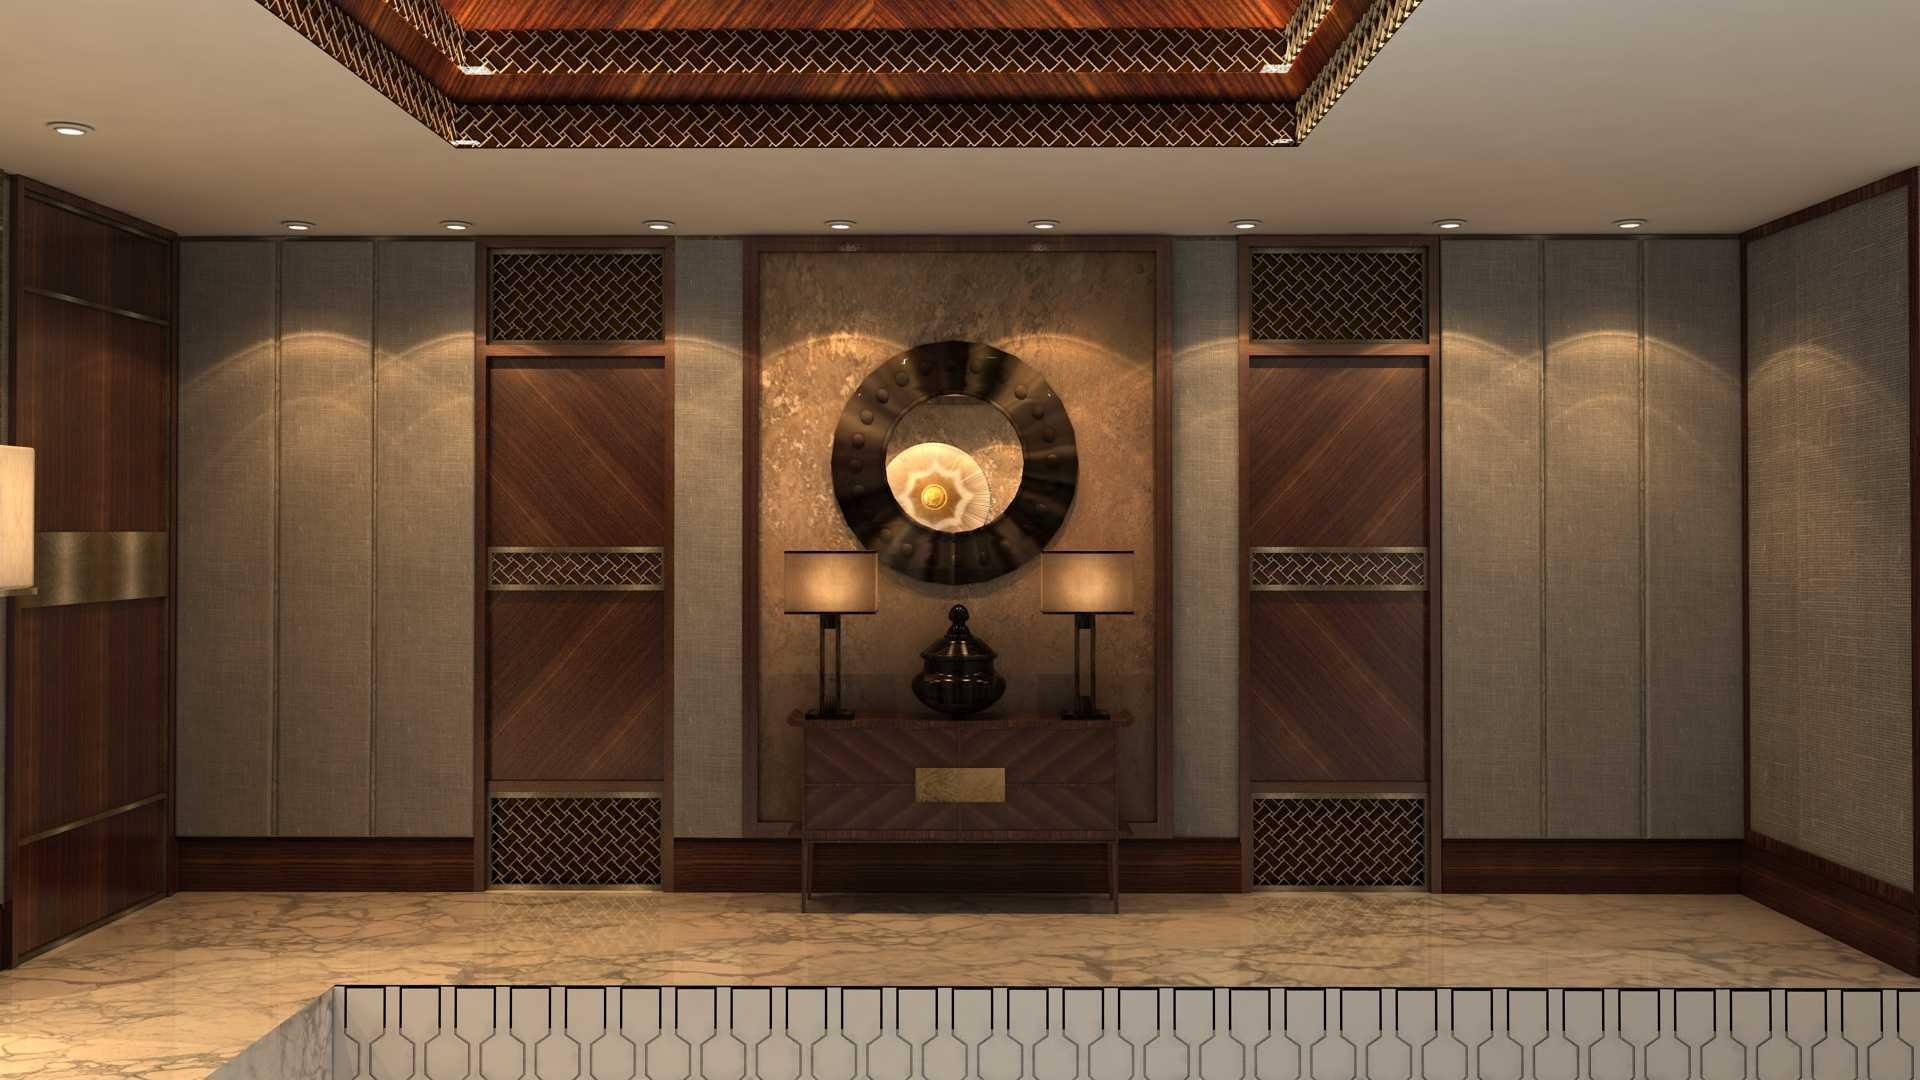 Vin•da•te Mayang Permai Residence Ii - Residential Project (Artist Impression - Construction In Progress) Pantai Indah Kapuk - North Jakarta Pantai Indah Kapuk - North Jakarta Lt Kontemporer  17215